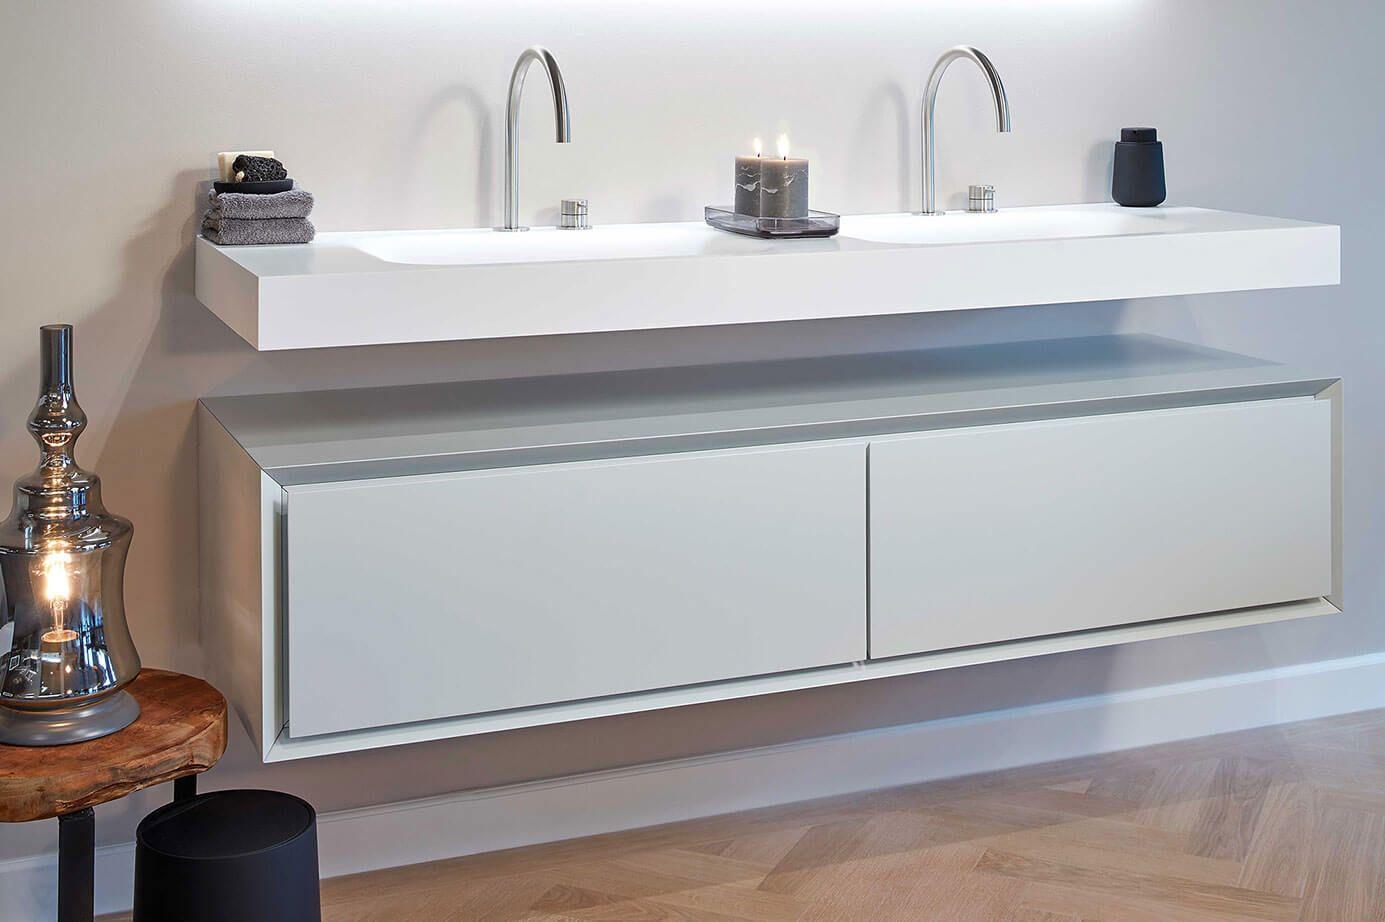 Badkamer Keuken Bolsward : Badkamermeubel bolsward design badkamermeubels keuken design